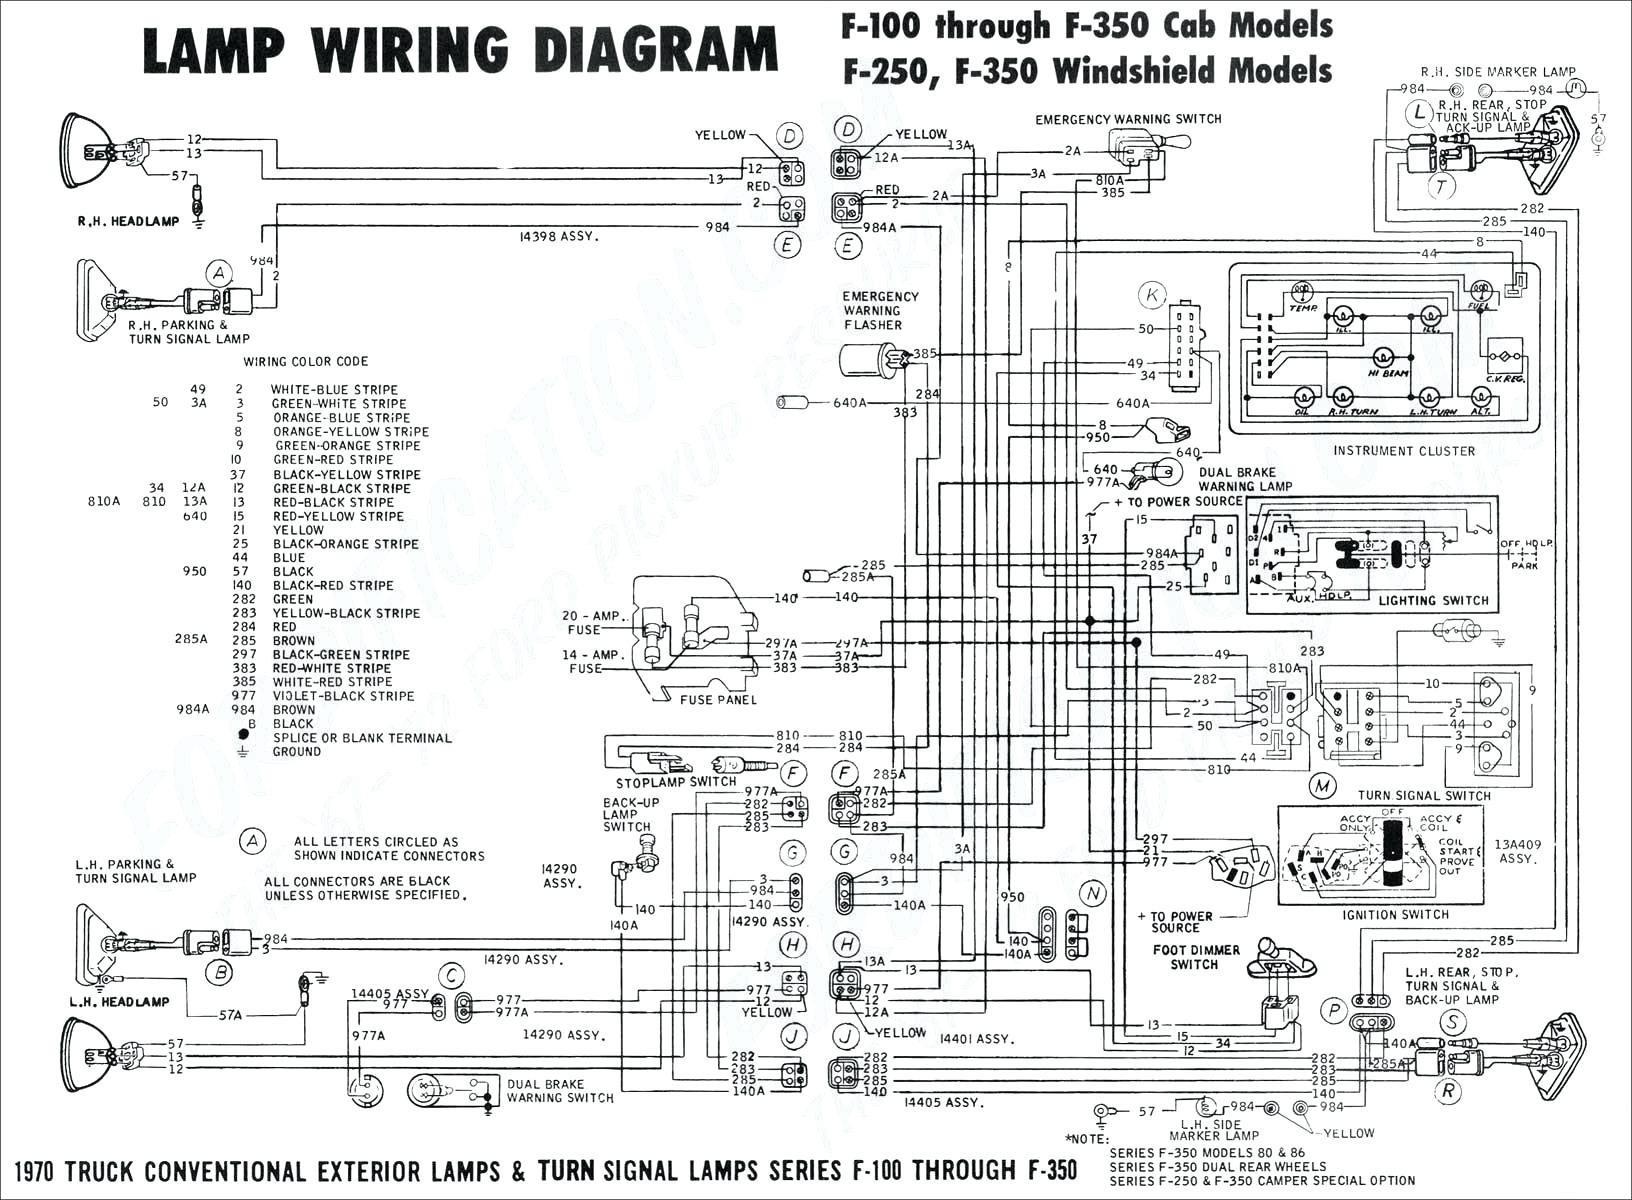 2003 Chevy Trailblazer Single Light Wire Diagram 1 Way Switch Wiring Diagram Of 2003 Chevy Trailblazer Single Light Wire Diagram